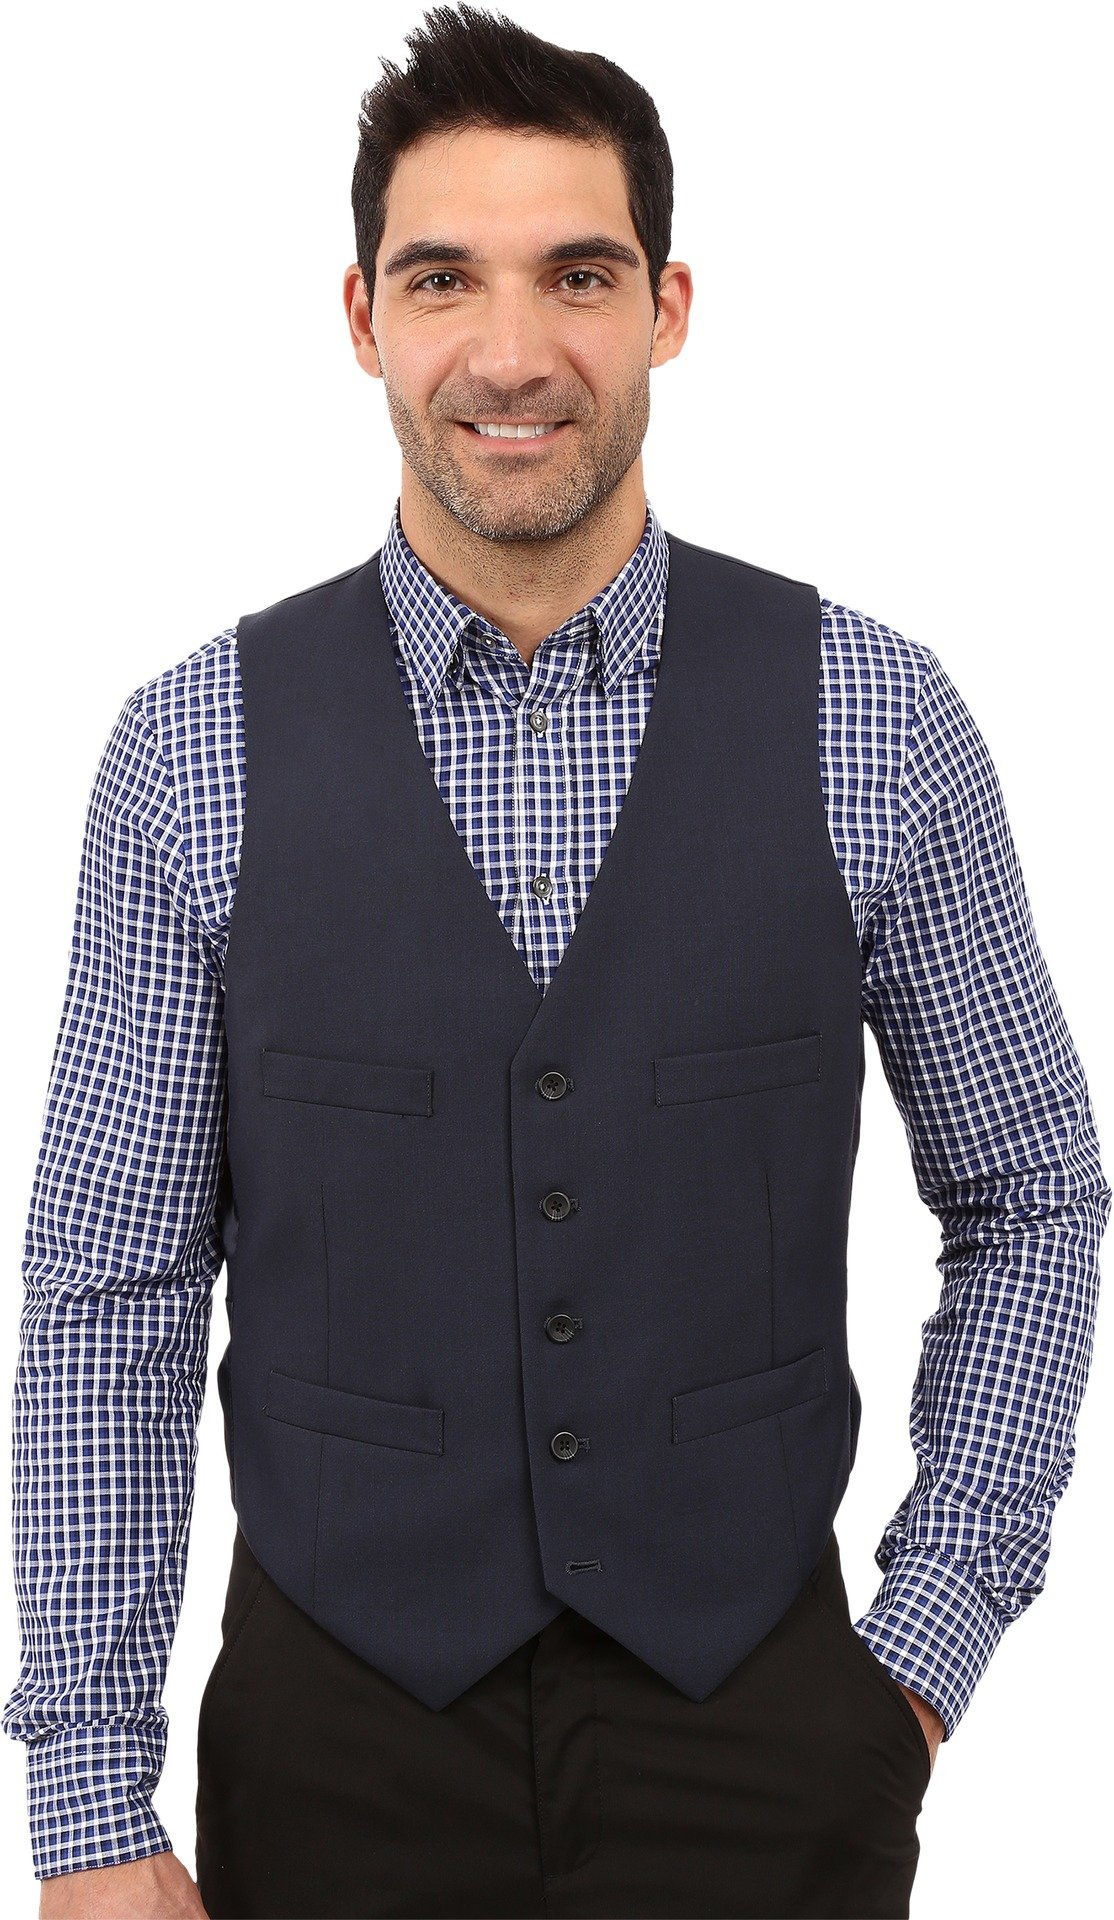 Kenneth Cole REACTION  Men's Slim Fit Separate Vest Blue Outerwear